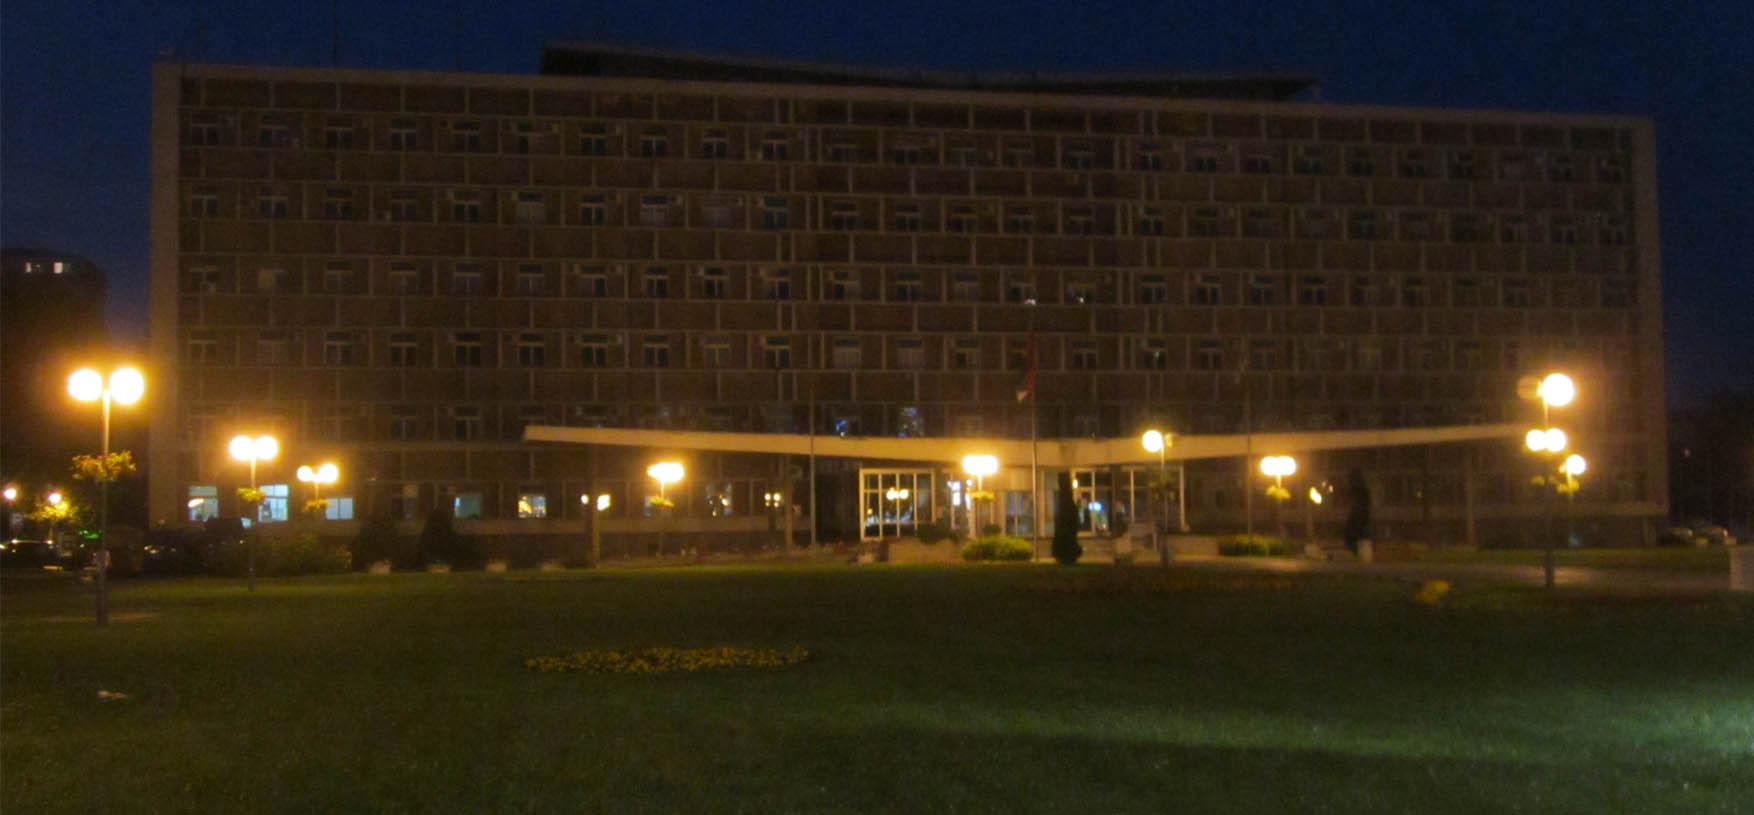 01 Kragujevac by night